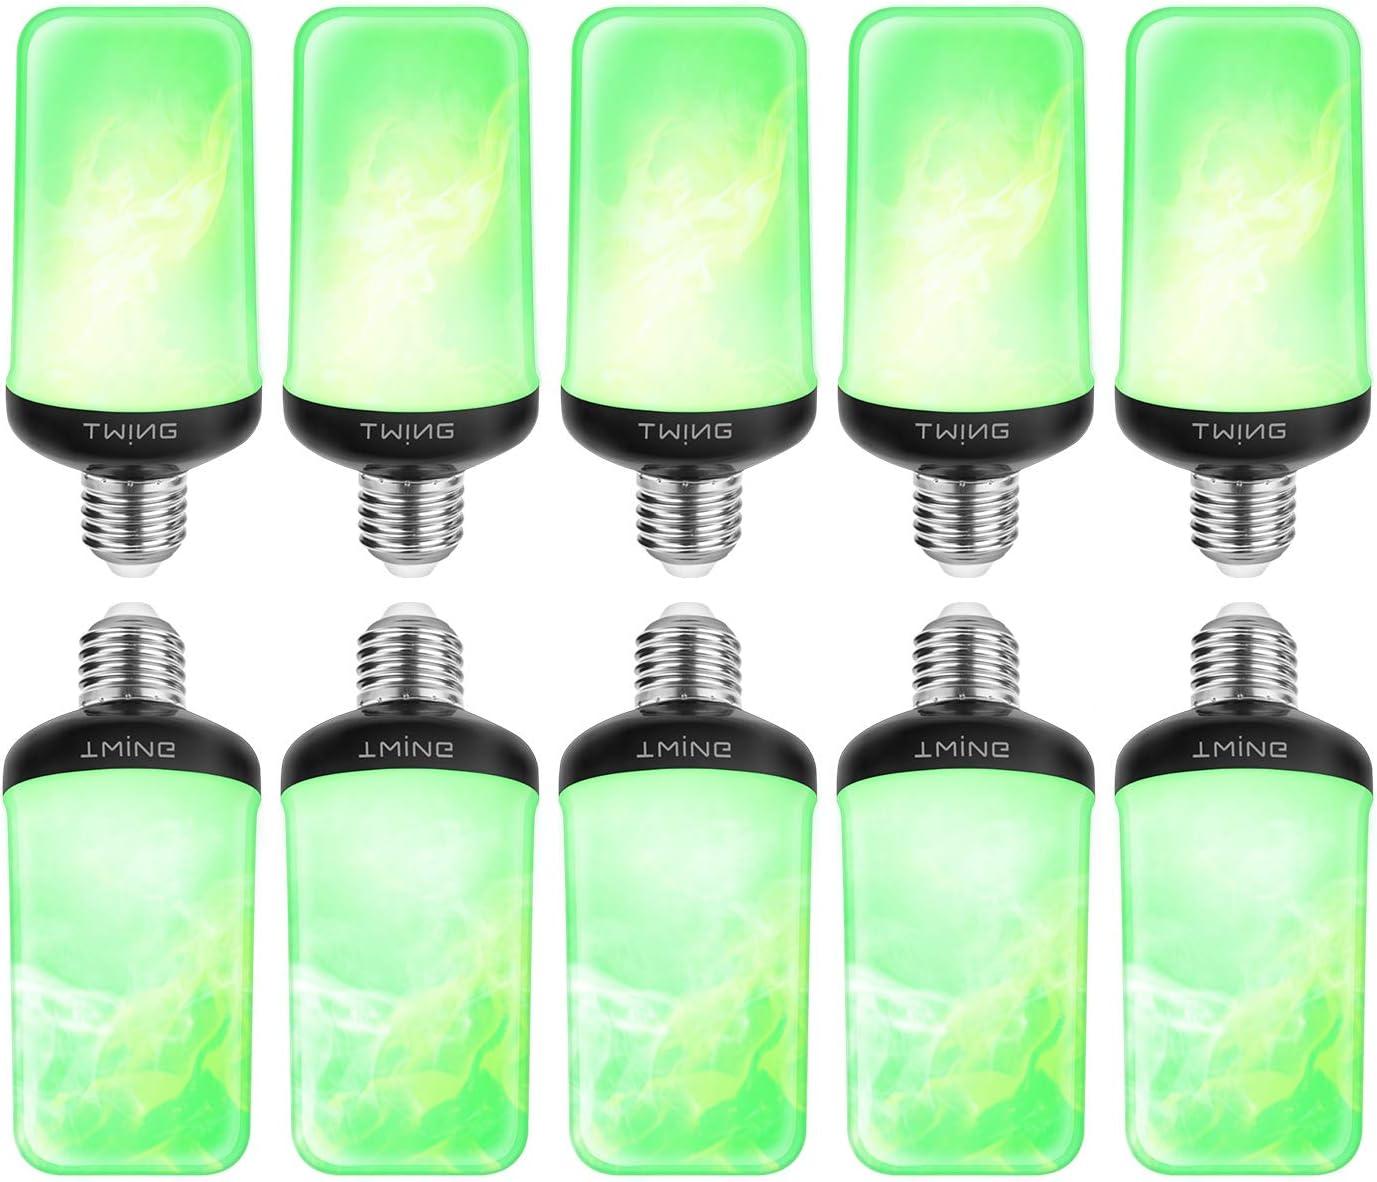 LED Flame Effect Fire Light Bulbs (Green) 99 LED 6W Flickering Light Bulb with Gravity Sensor,4 Modes E26/E27 Base Flame Light Bulb for Halloween Christmas Indoor Outdoor Home Decor (10 Pack)